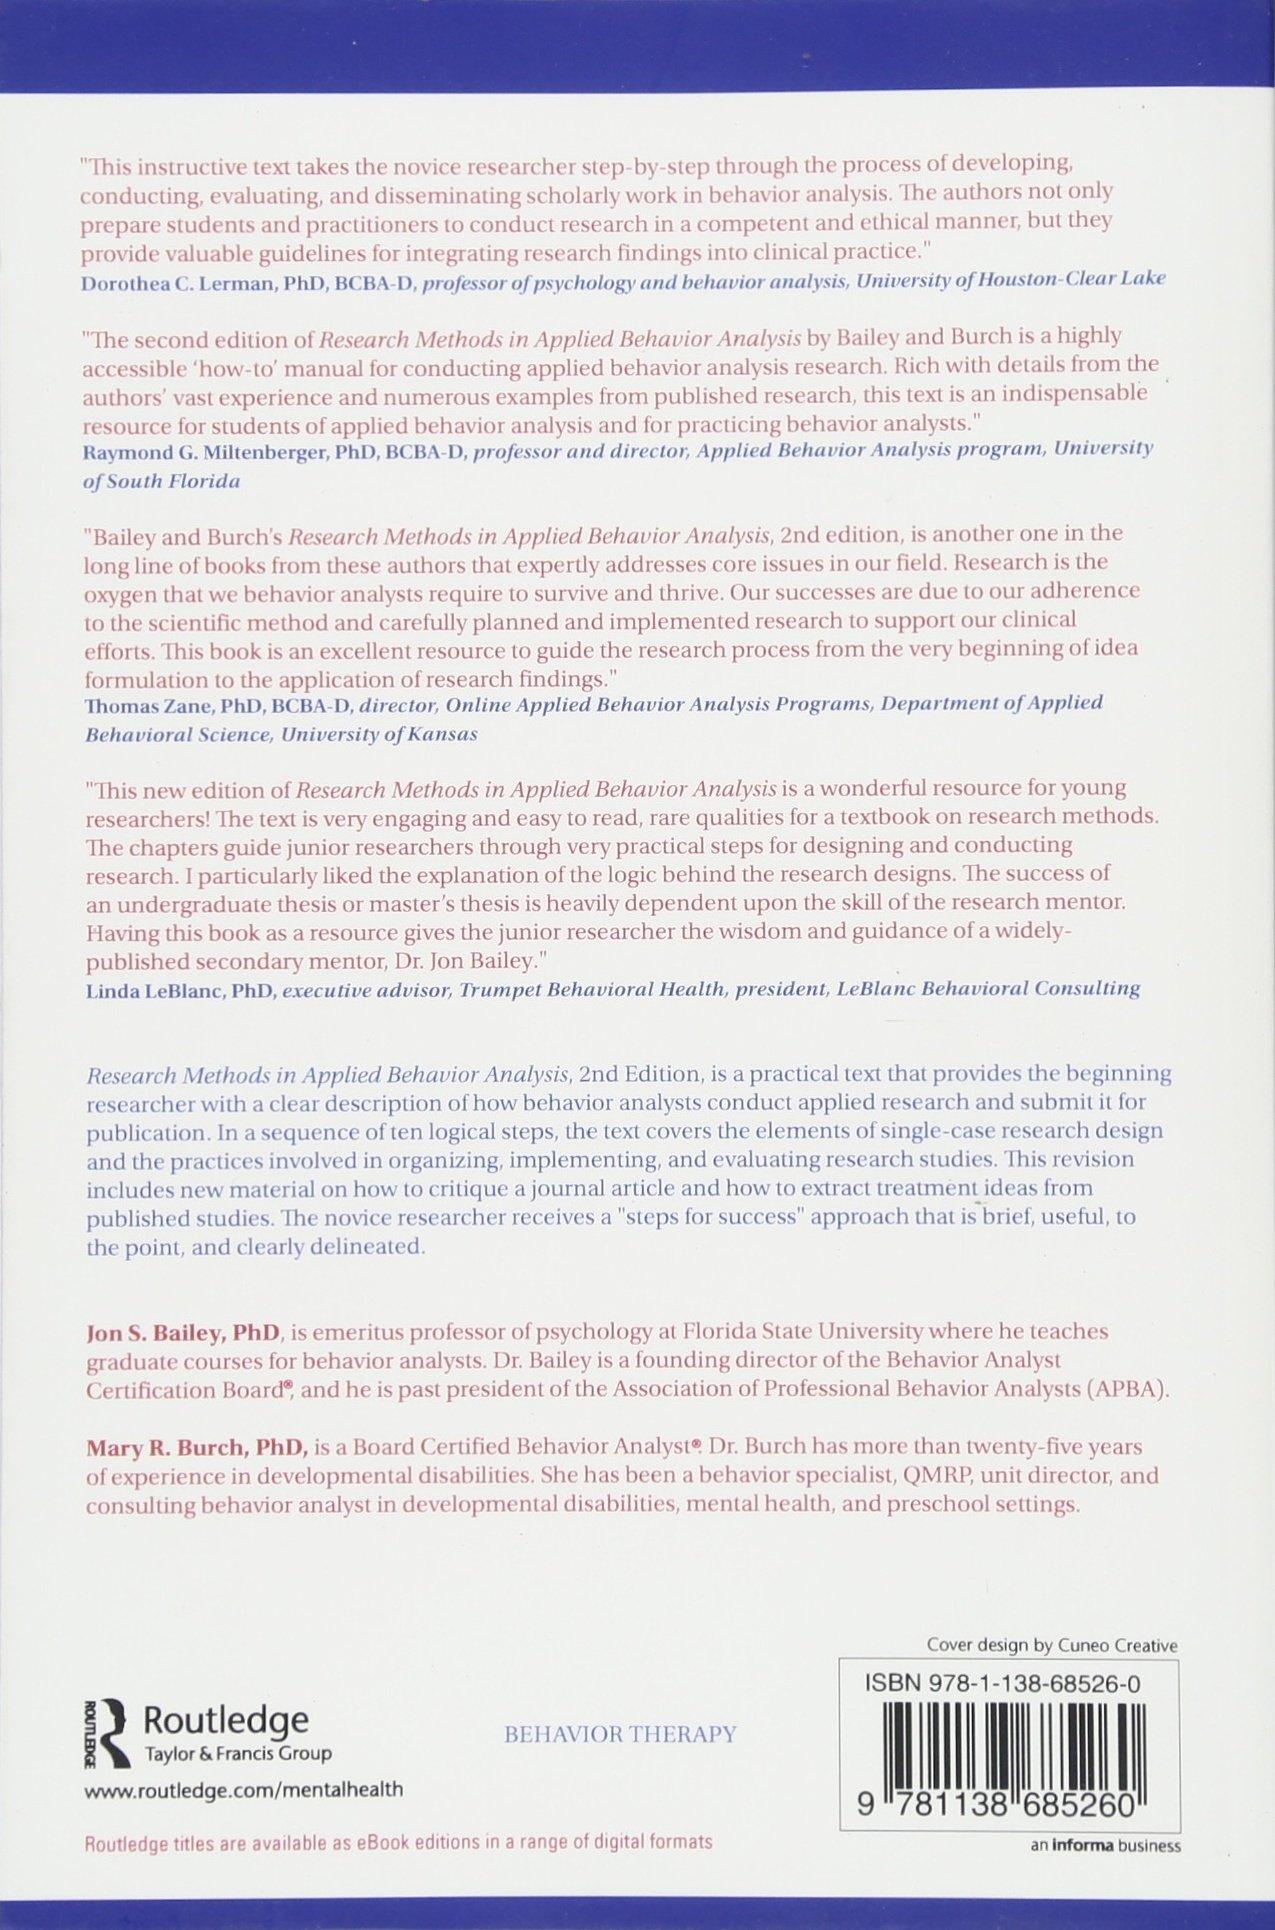 Research Methods In Applied Behavior Analysis Amazon Jon S